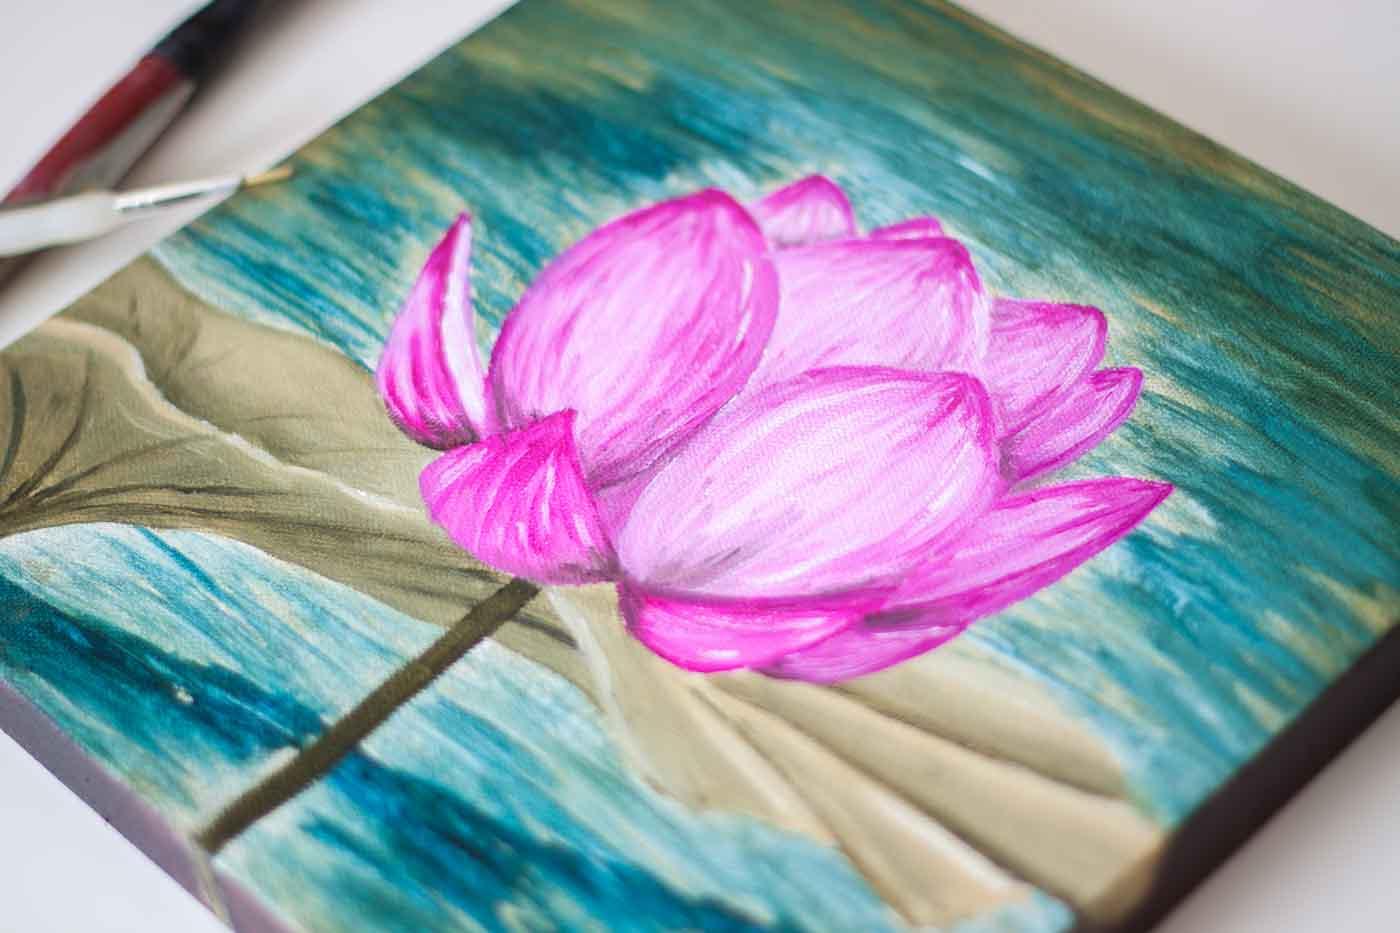 Pink-Lotus-Flower-Painting-2190